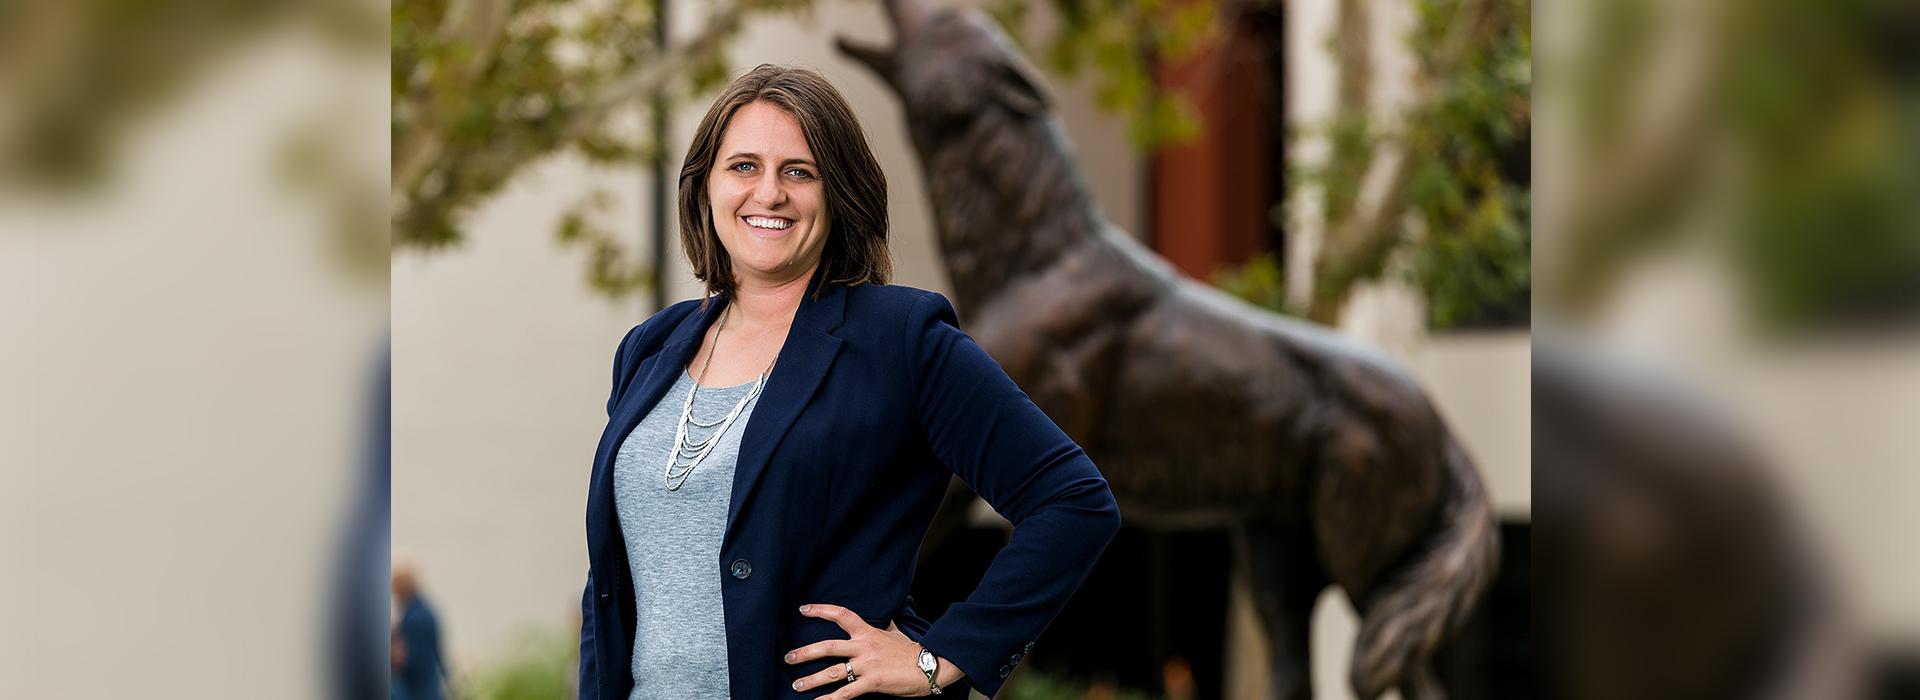 CSUSB announces new associate vice president for Enrollment Management